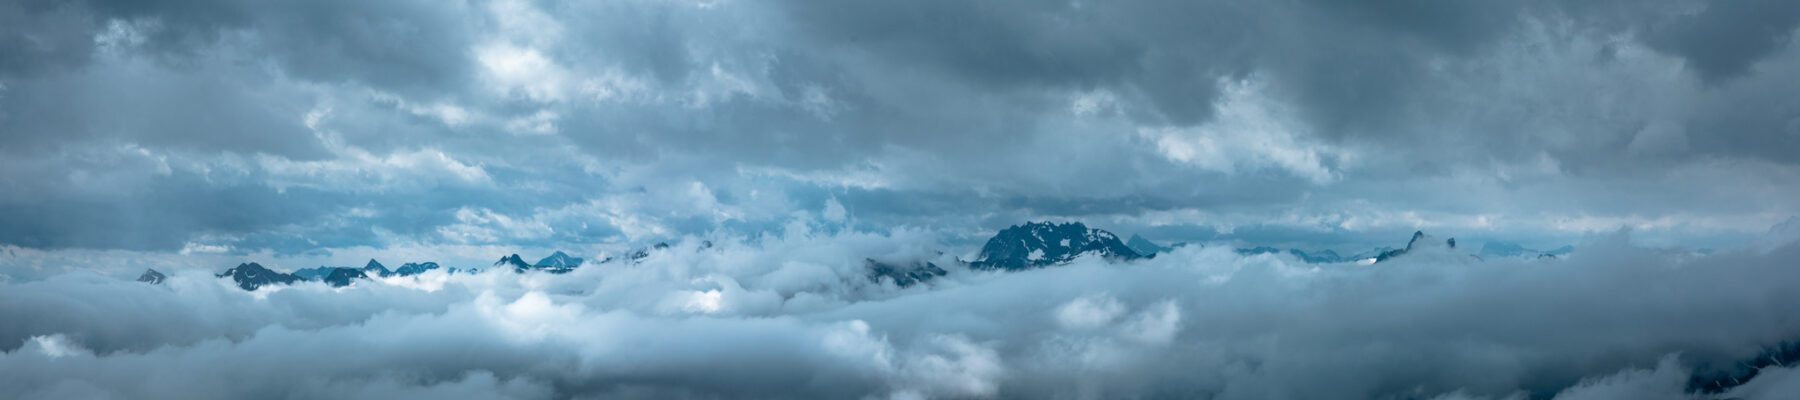 Sankt Anton am Arlberg St. Anton - Inbetween the Clouds 1-2048